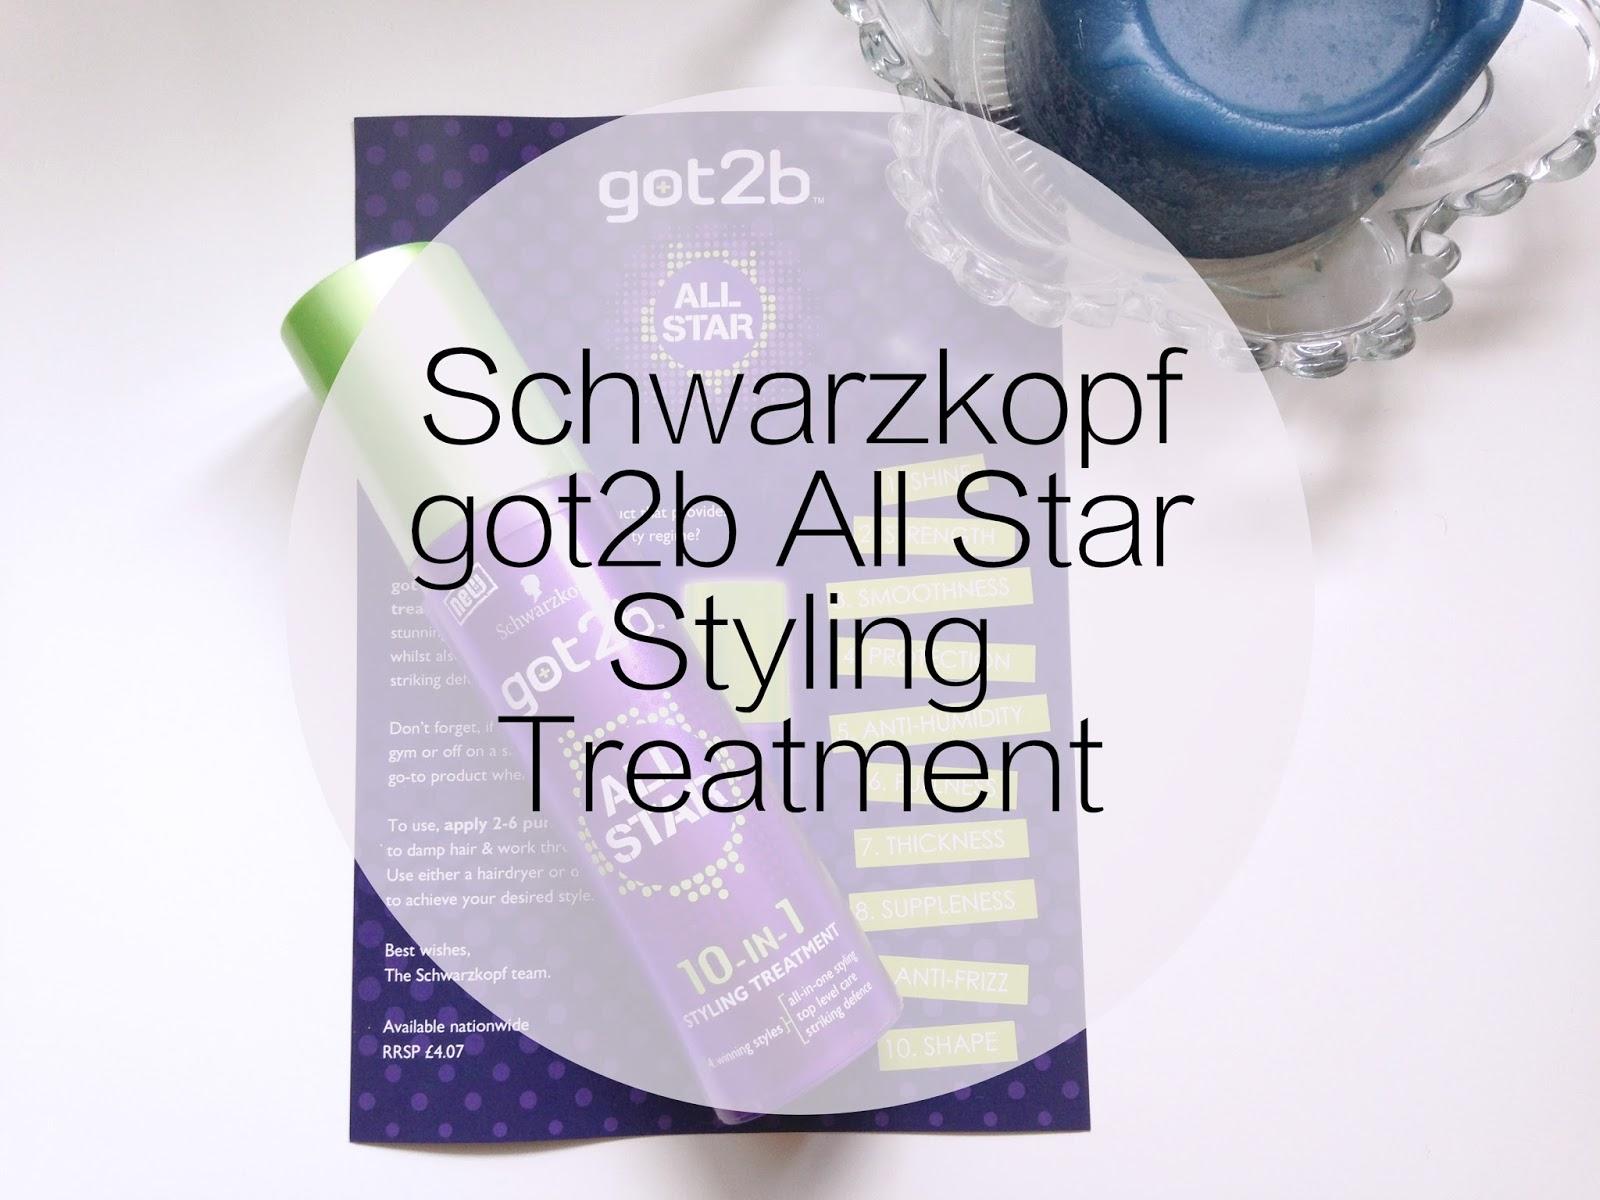 Schwarzkopf got2b All Star Styling Treatment